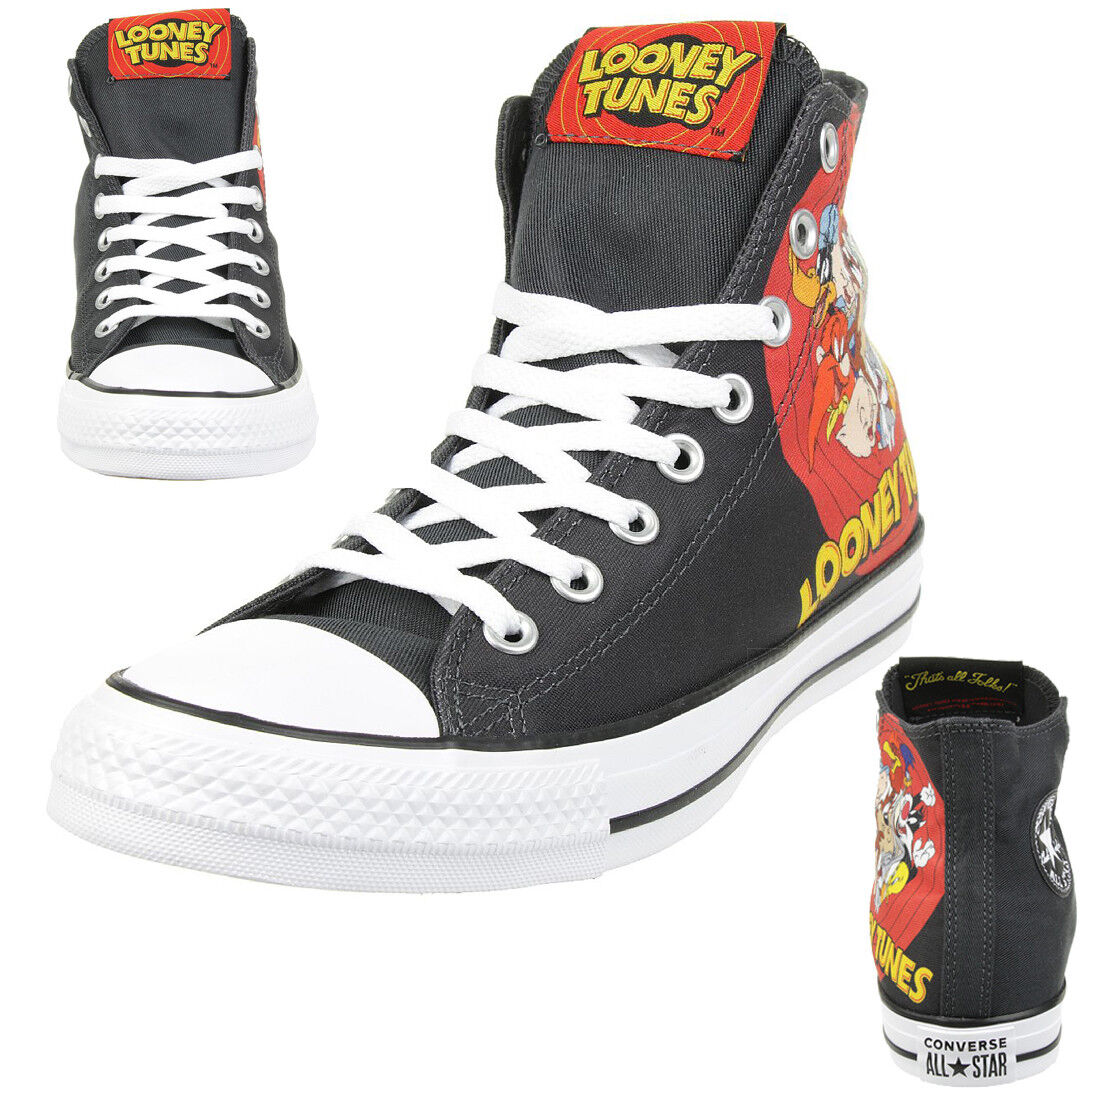 Converse C Taylor A/S HI Chuck Schuhe Sneaker canvas Looney Tunes 160901C